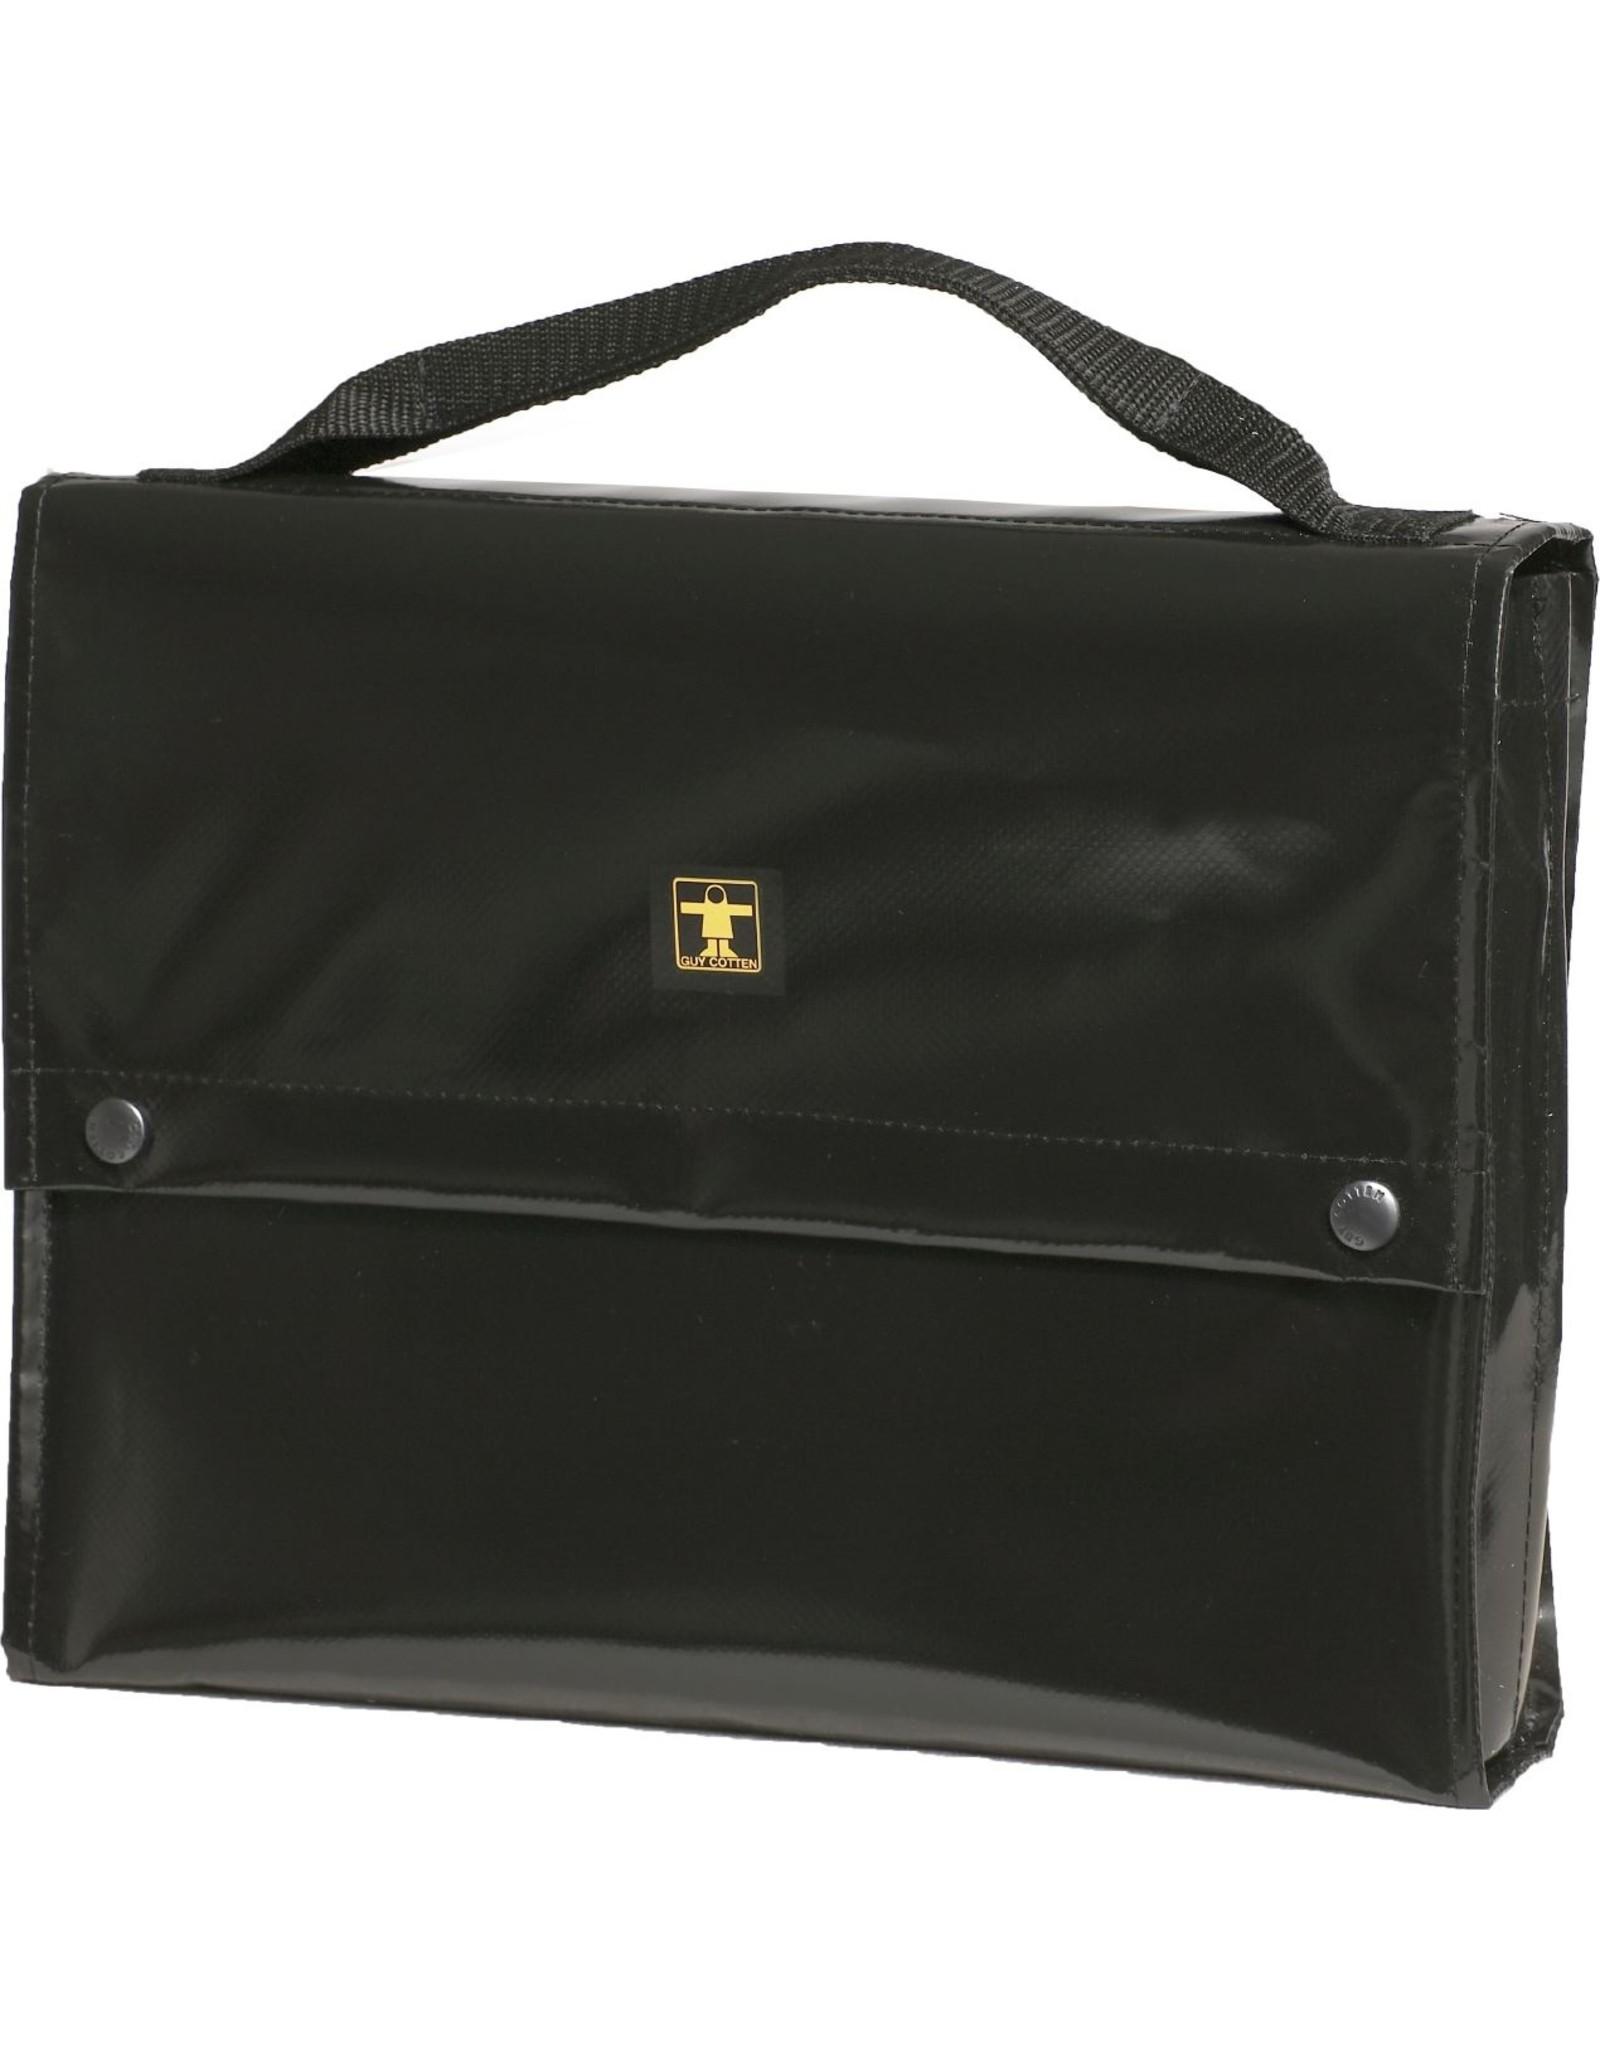 Guy Cotten Bag DOCUMENT 25x33cm